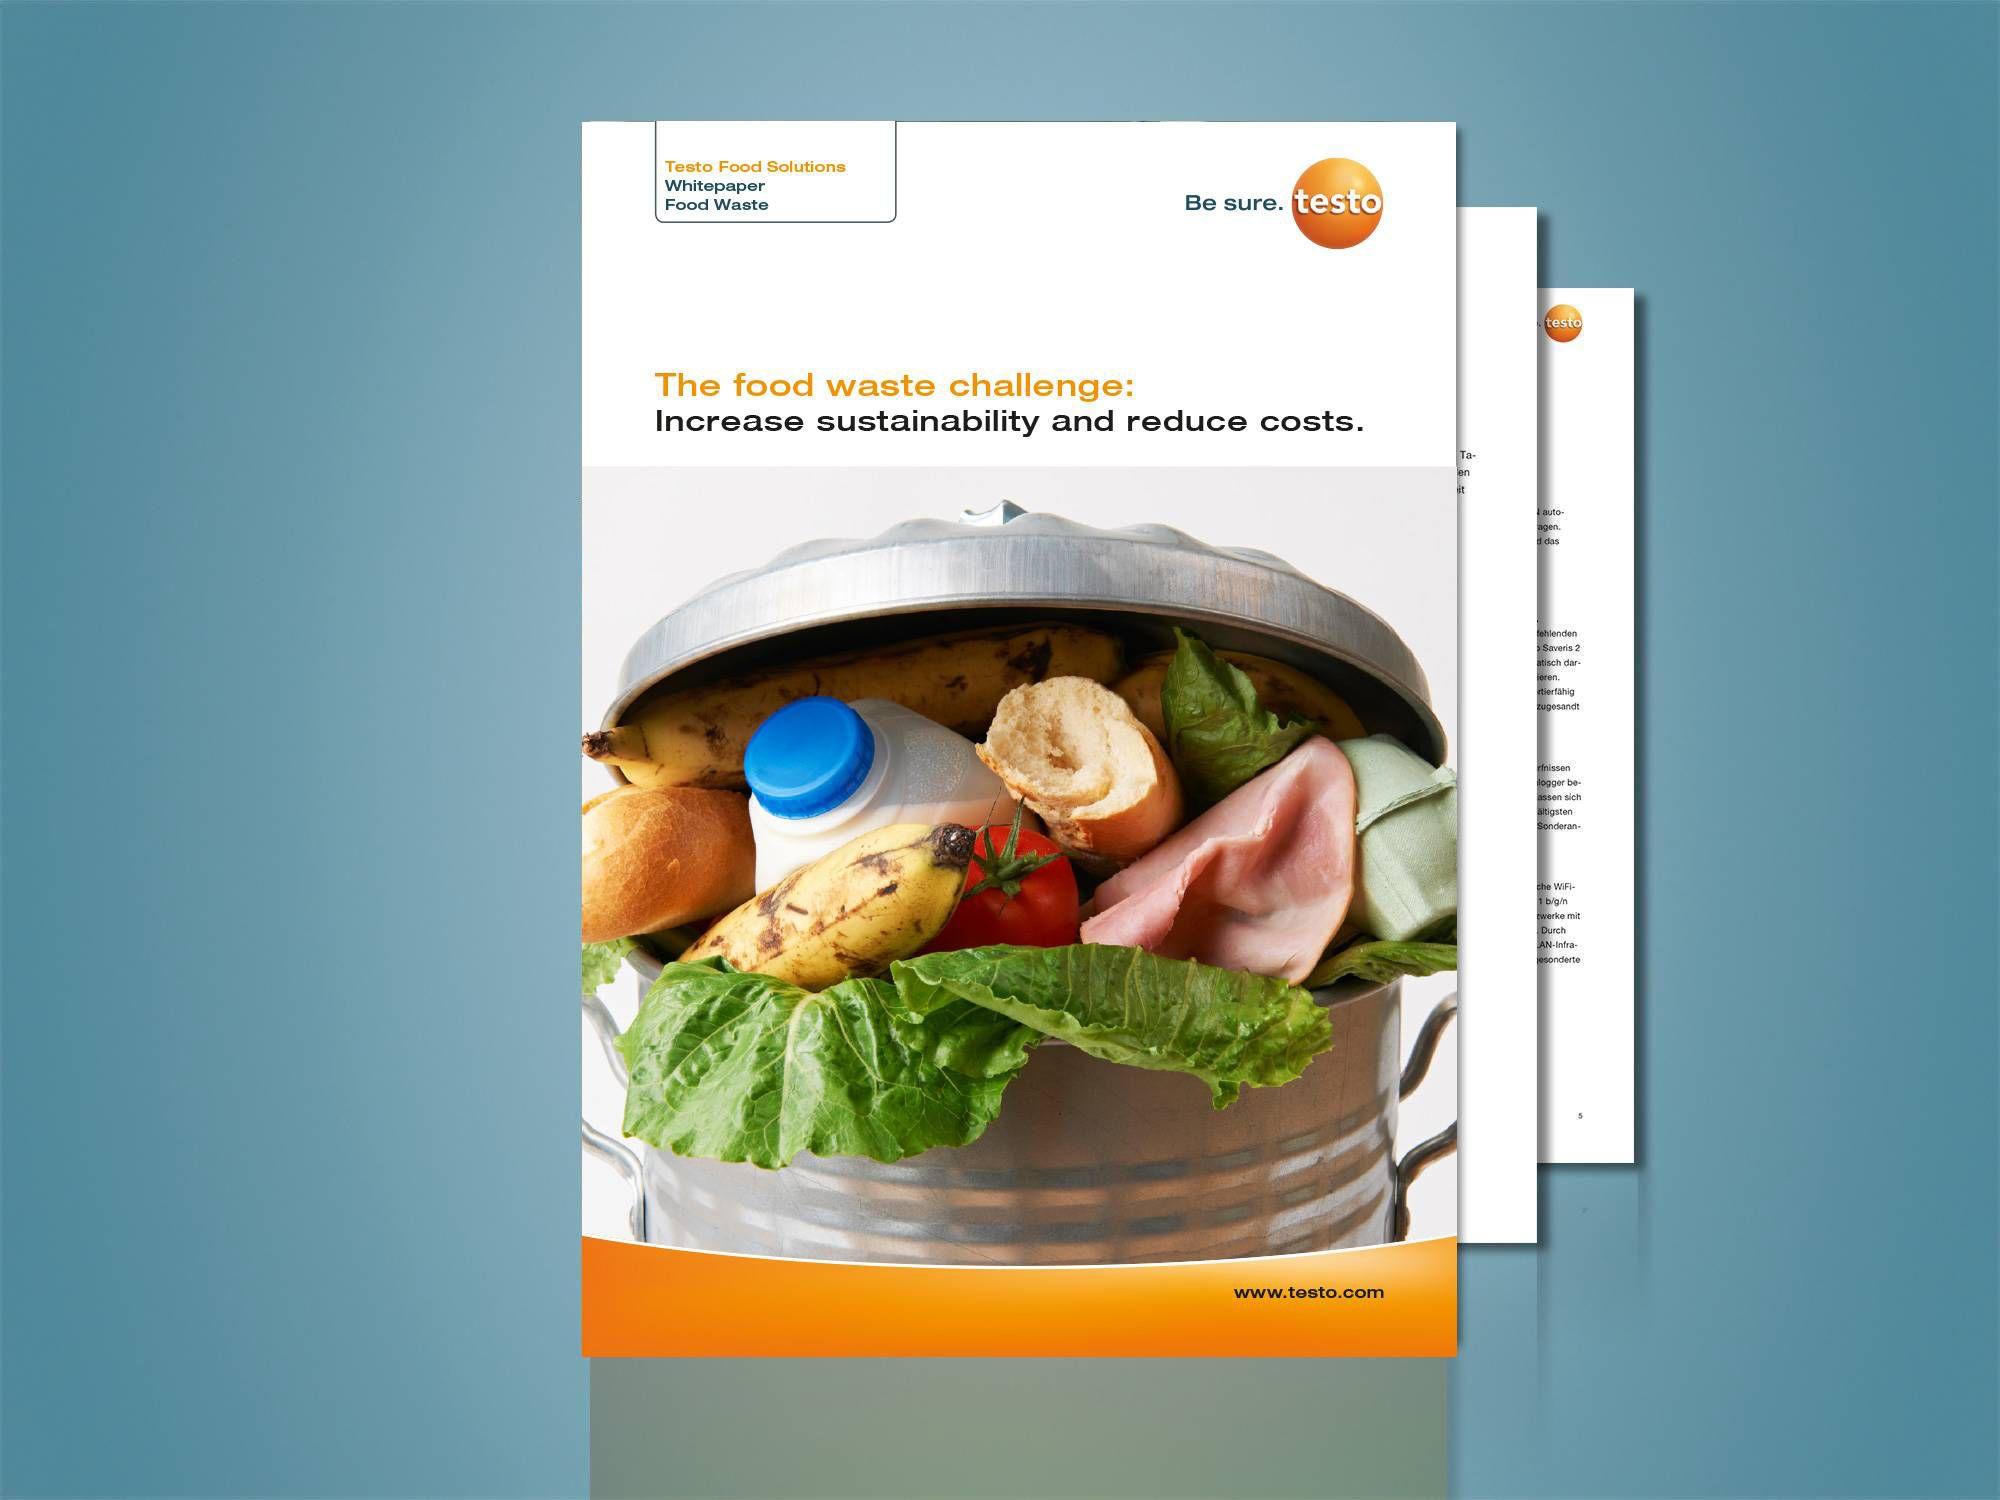 teaser-solutions-whitepaper-food-waste-2018-2000x1500.jpg